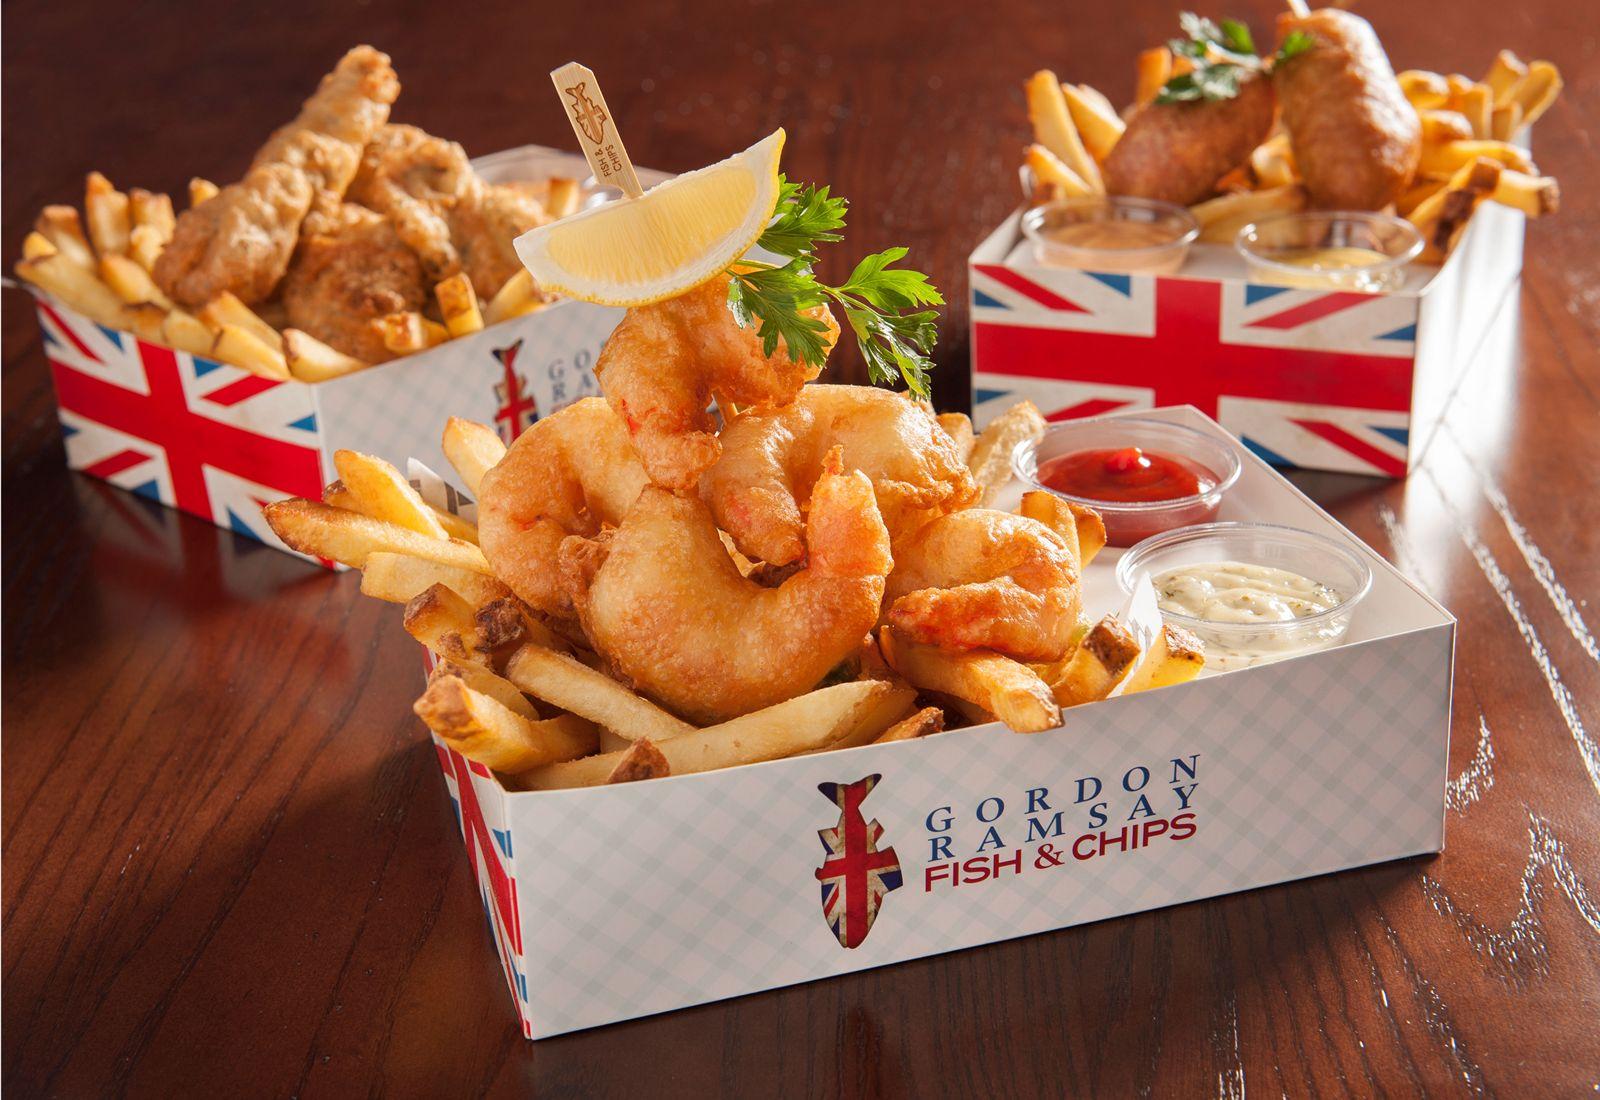 Gordon Ramsay Fish & Chips Dirty Chips